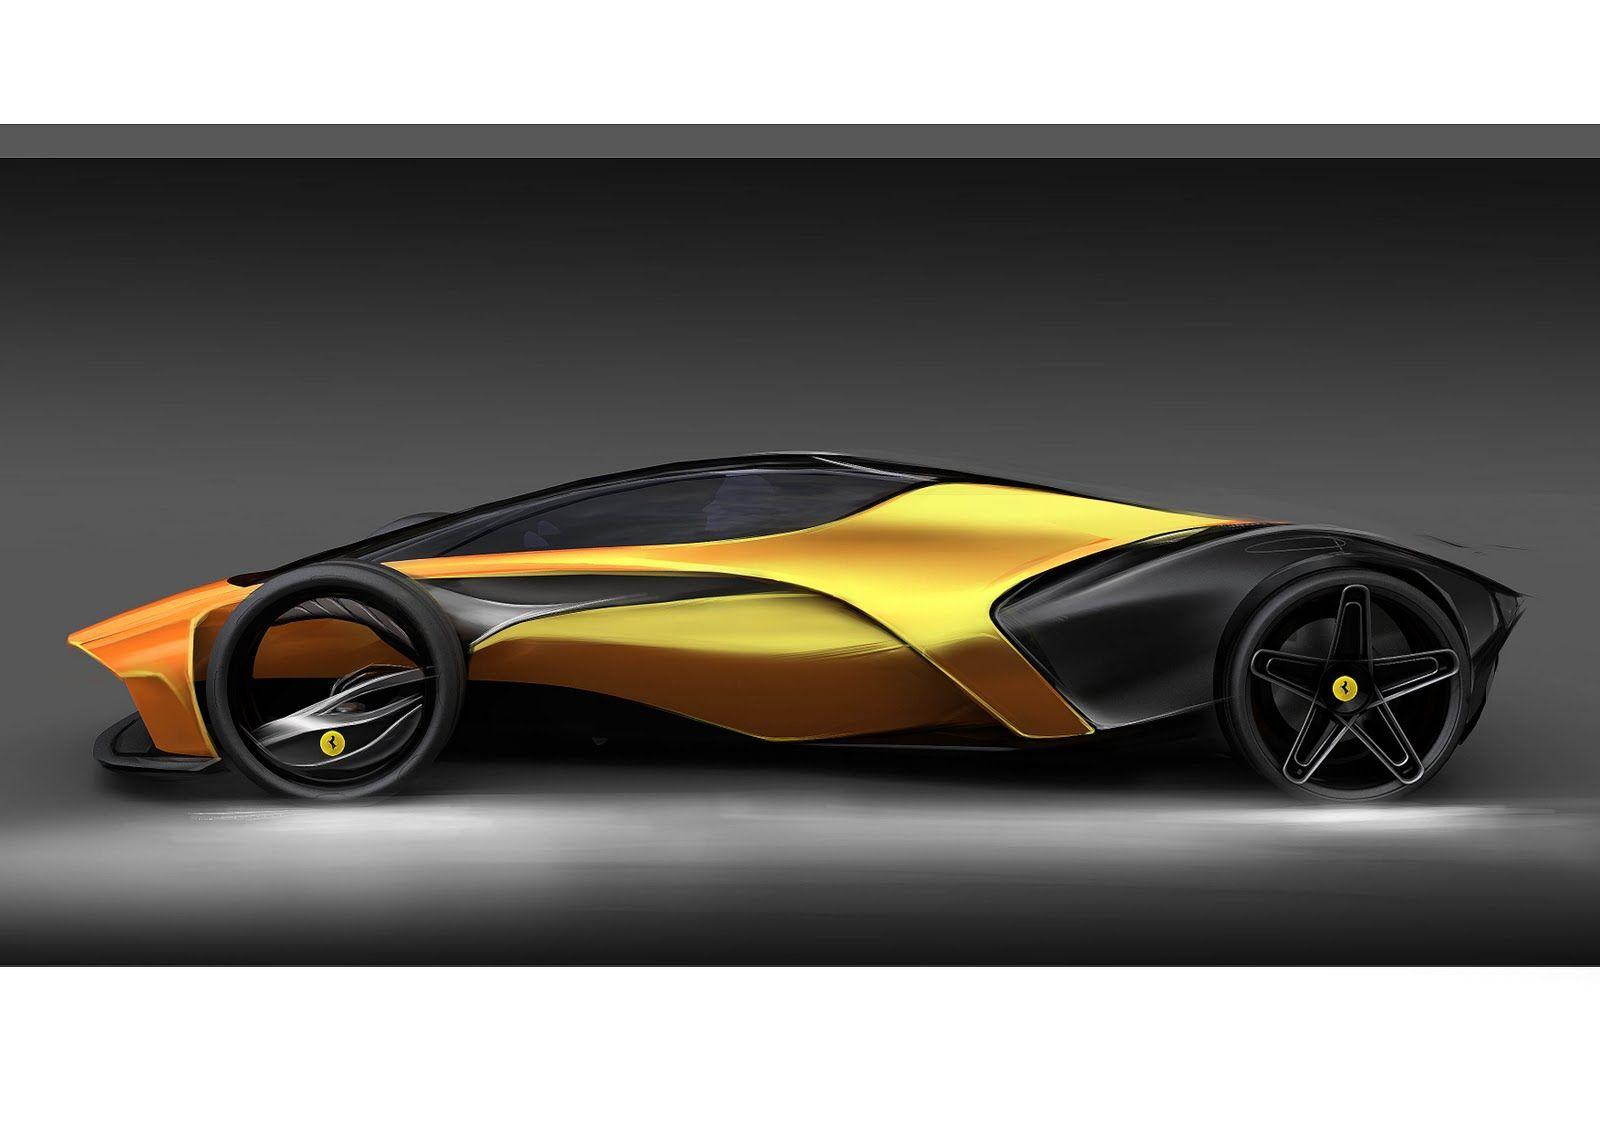 Car Design And My Life Side View Ferrari Concept Cars Futuristic Cars Design Future Concept Cars